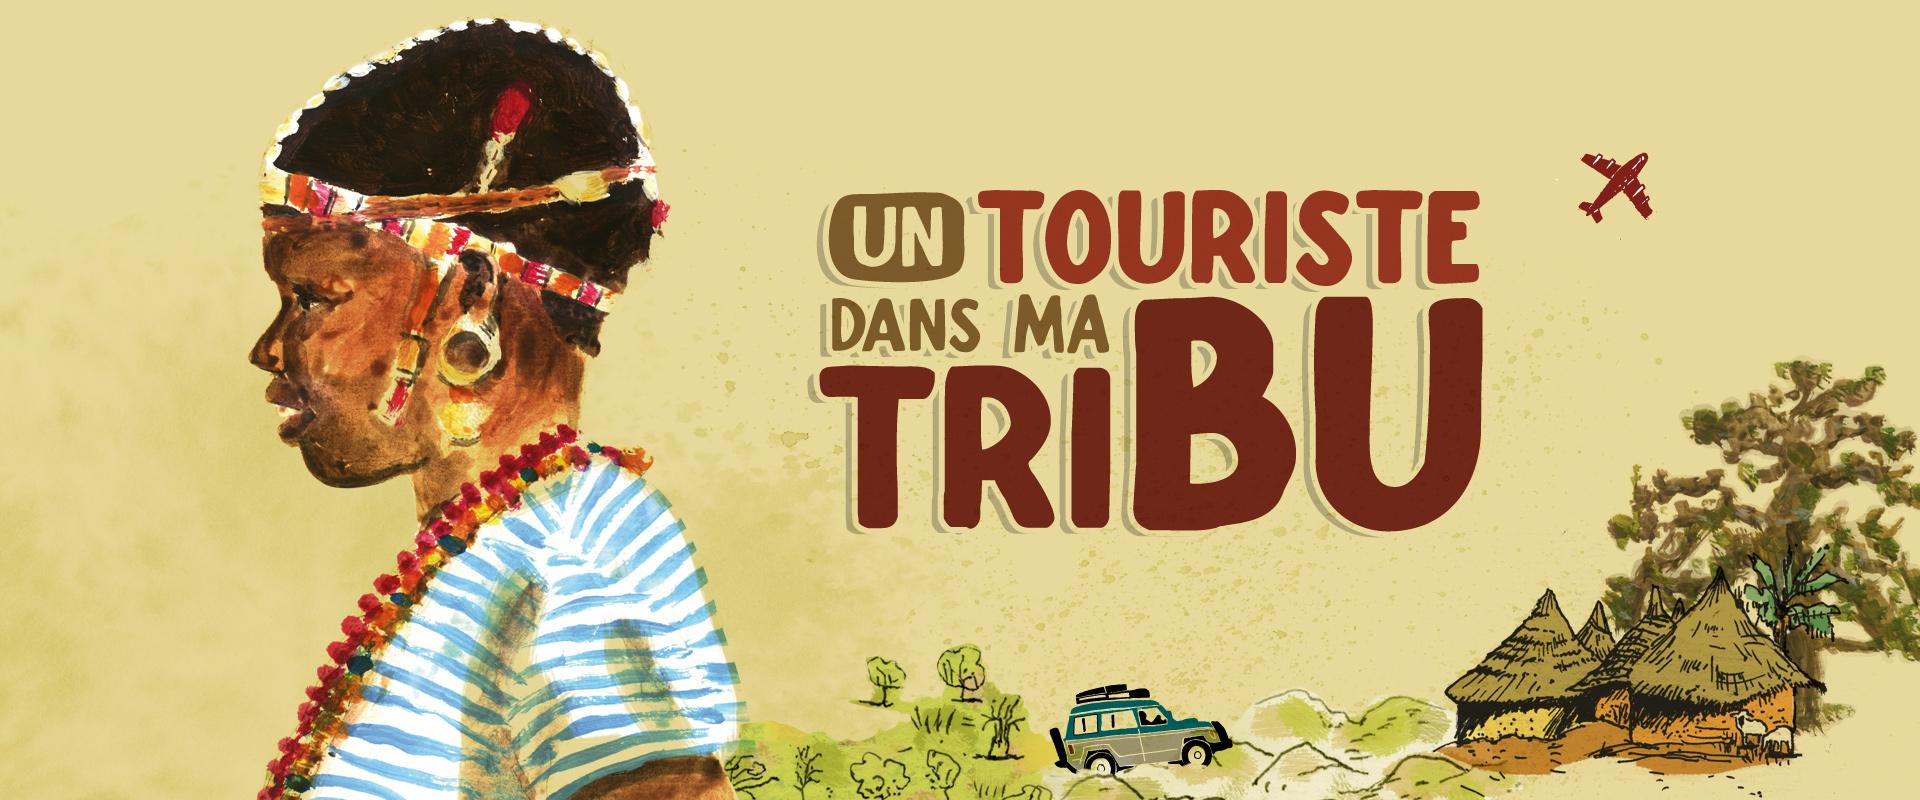 logo-un-touriste-dans-ma-tribu